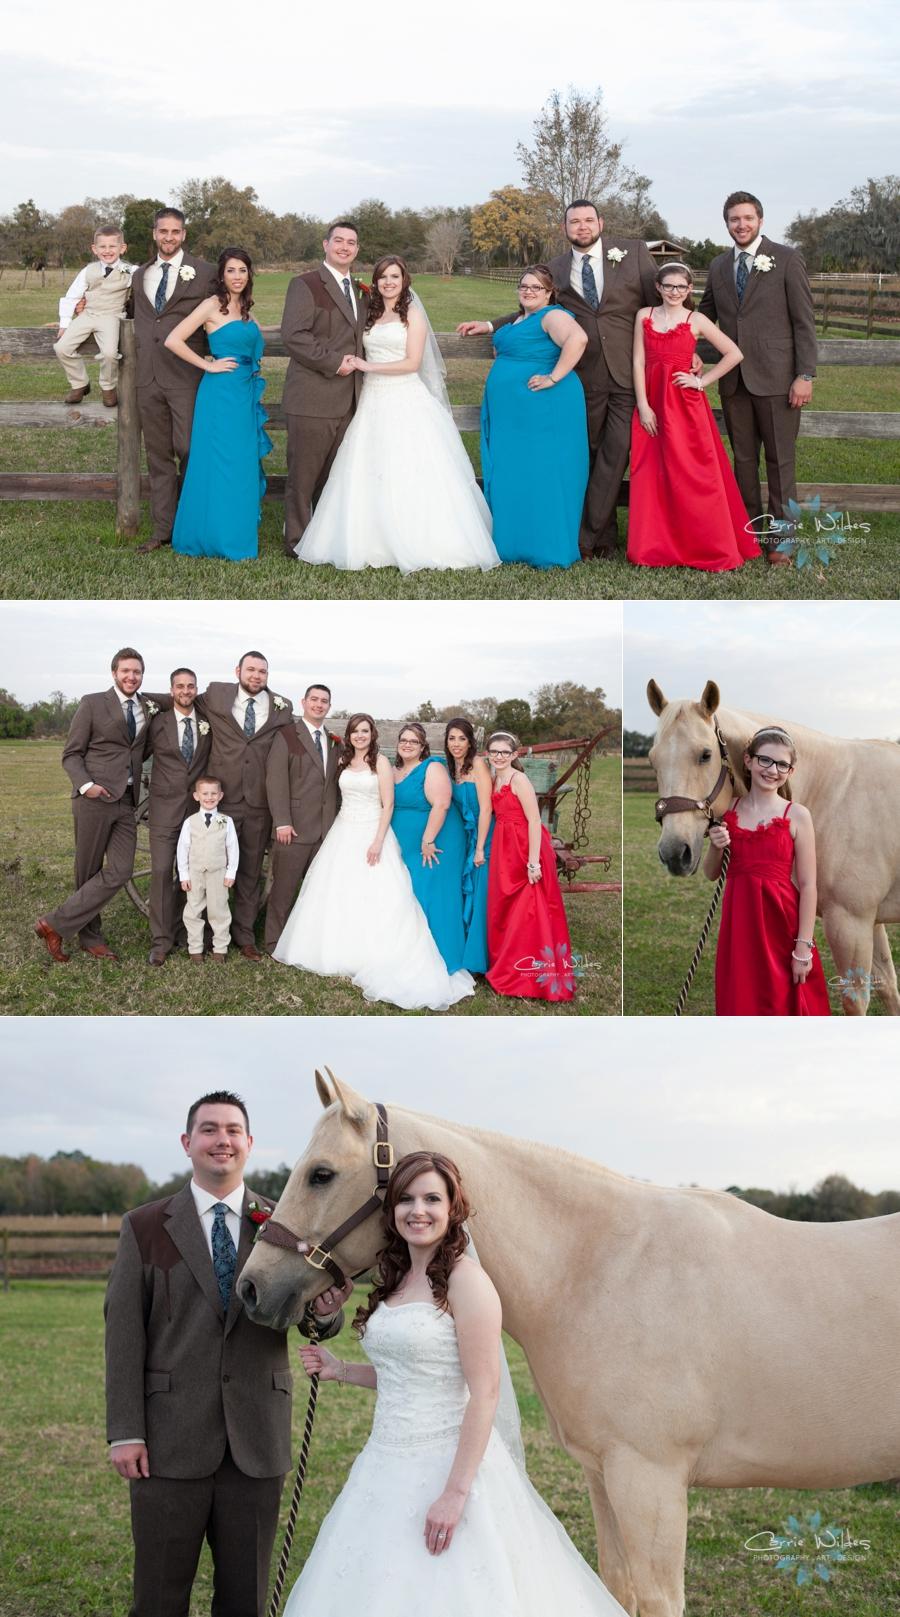 2_21_15 Wishing Well Barn Wedding_0103.jpg